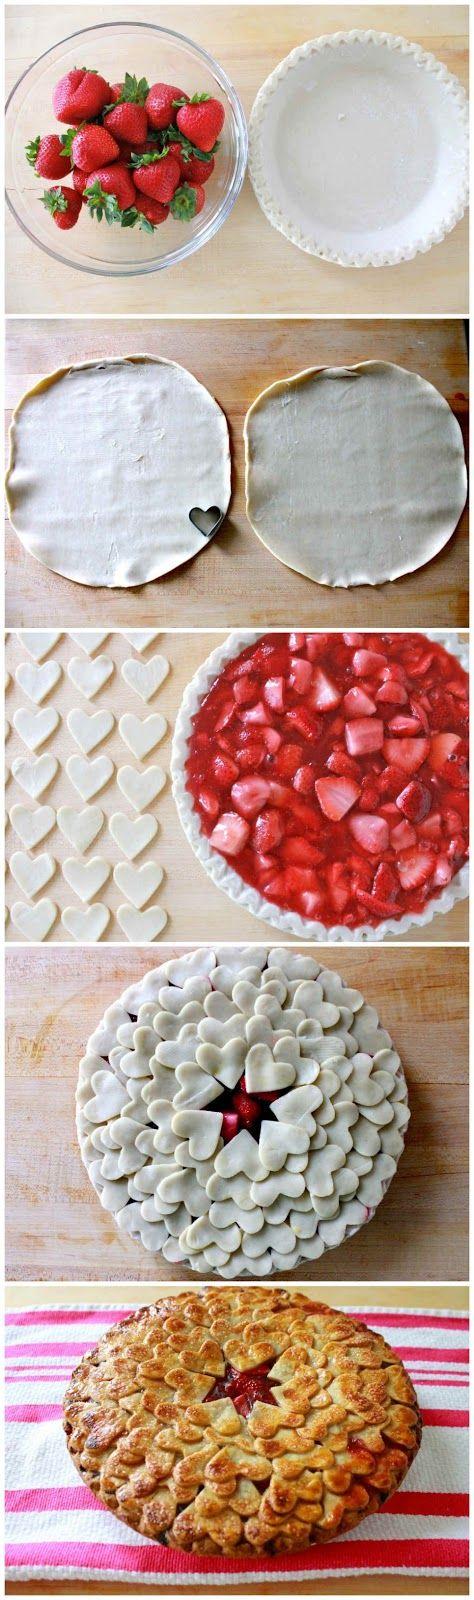 -Simply beautiful heart pie crust